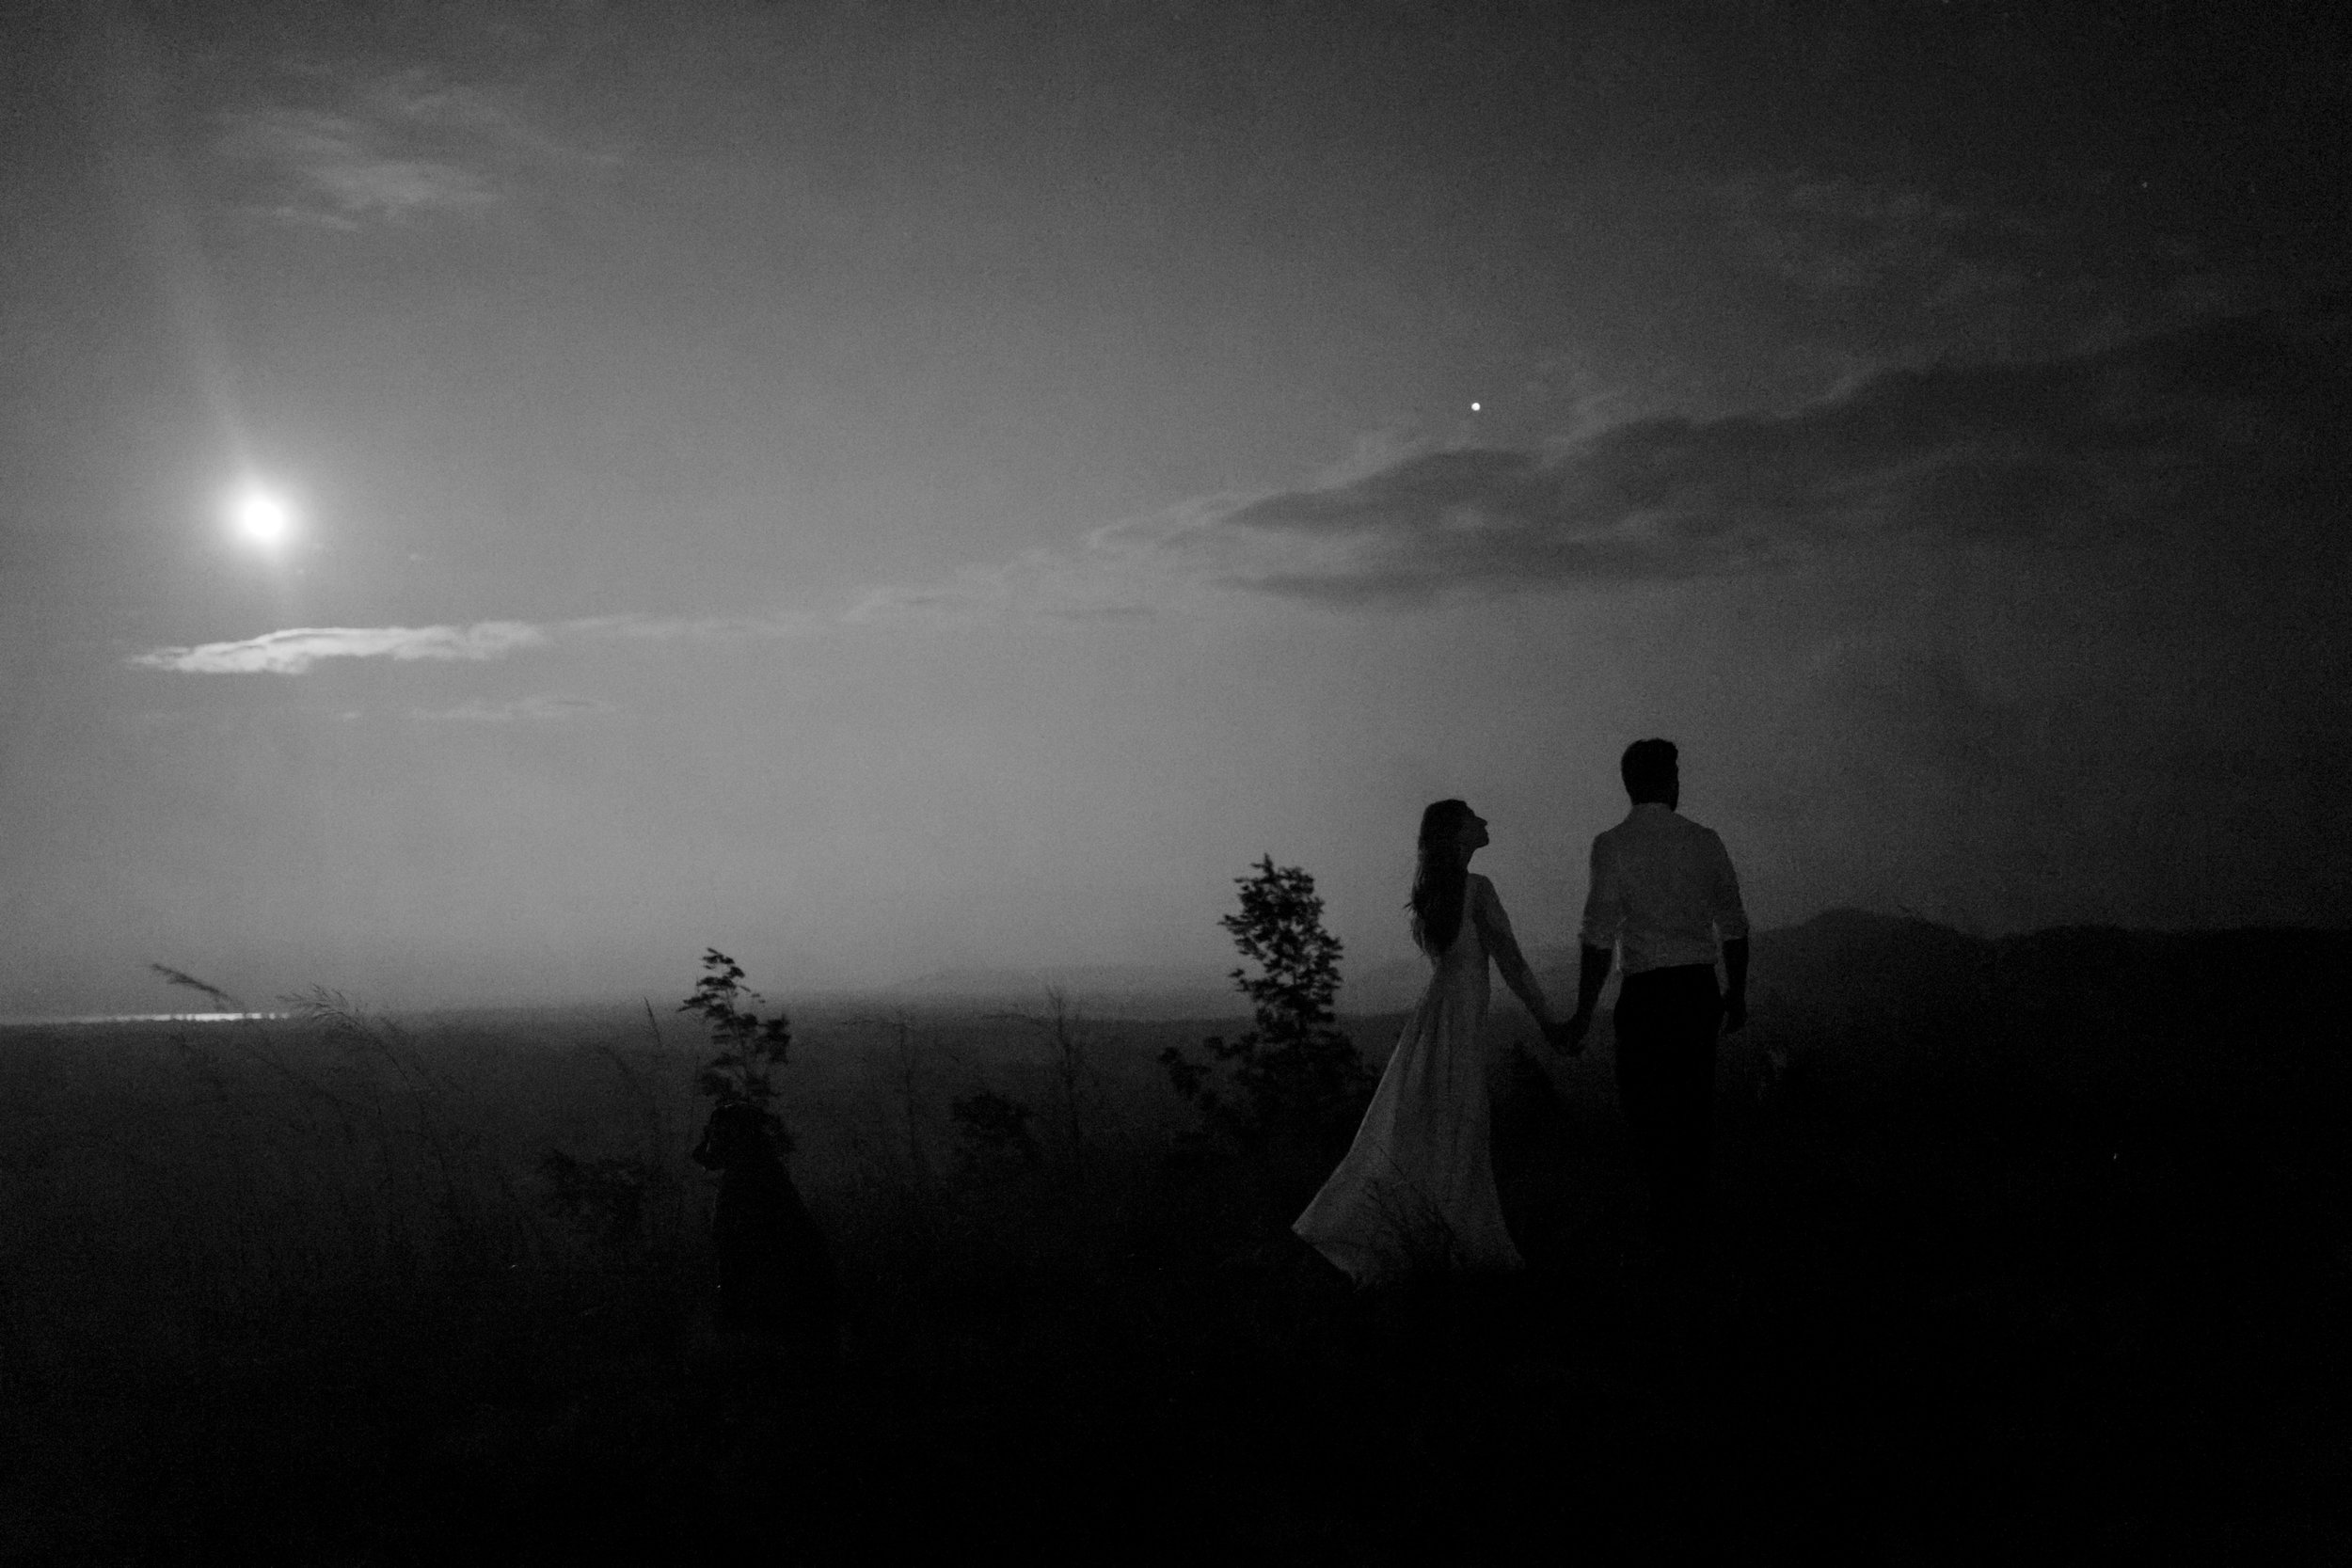 michigan-emotive-photographer-moonlight-elopement-mariha-hunter-325.jpg